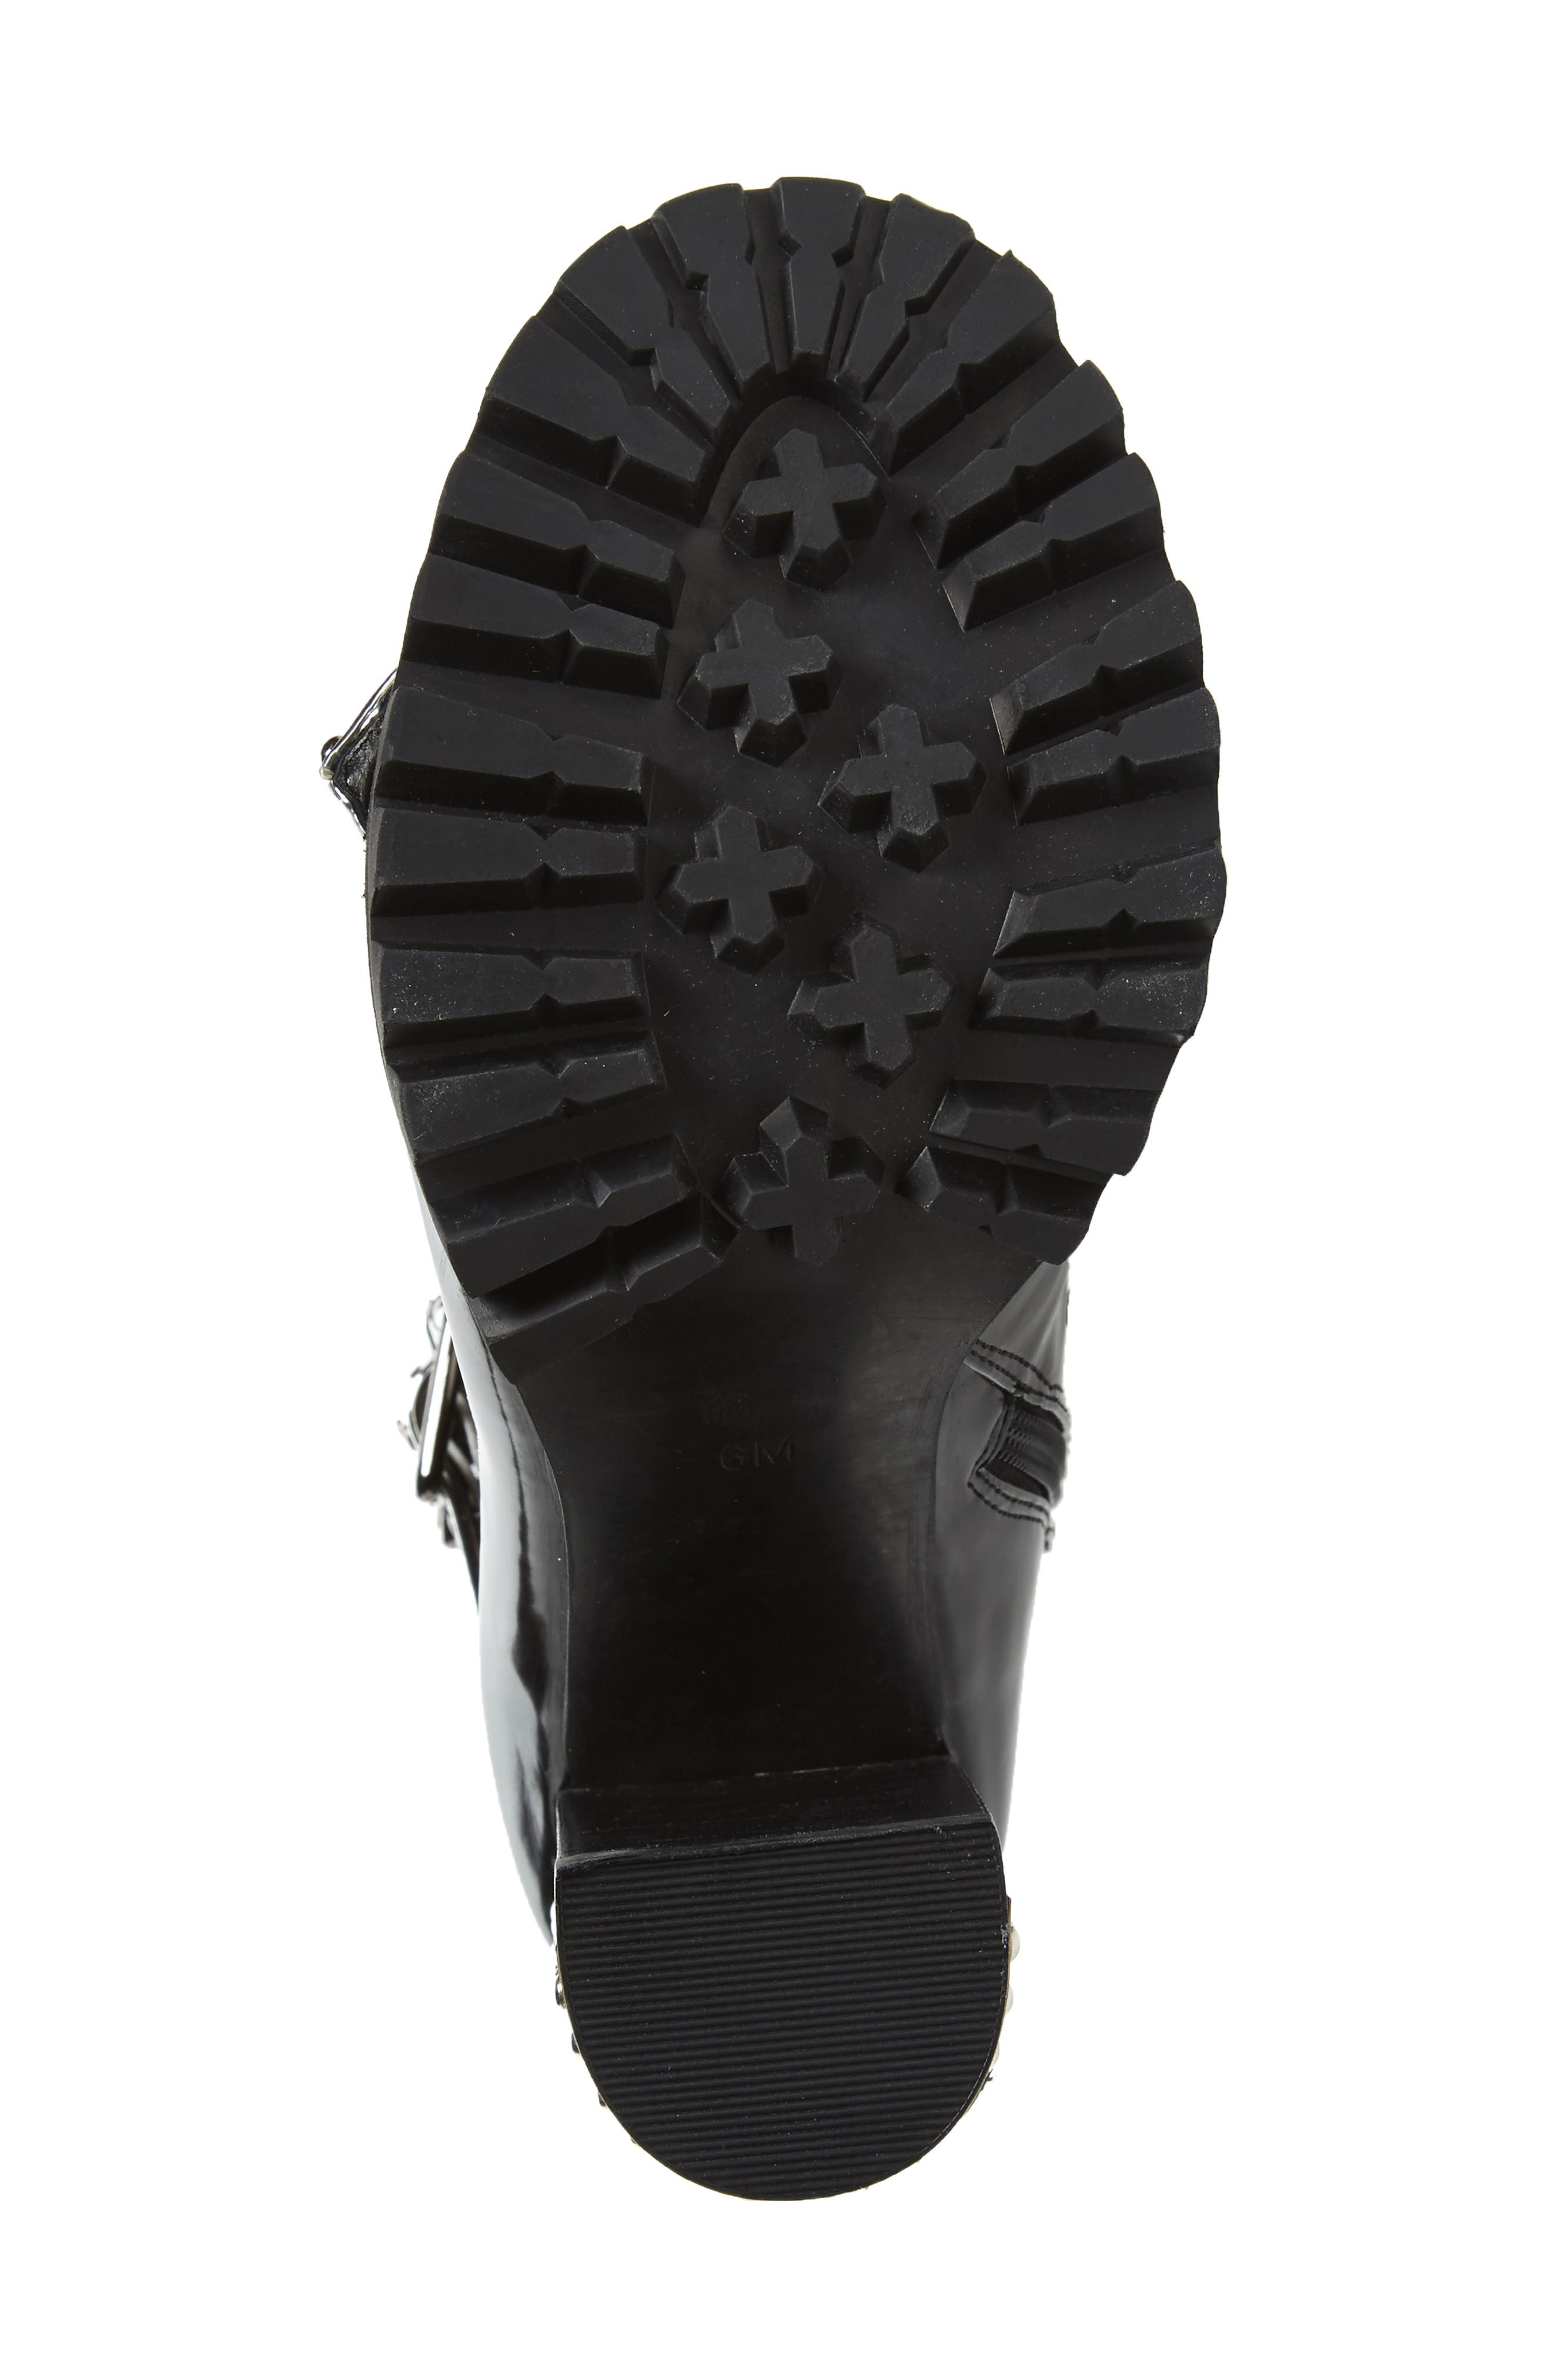 Scorpius Armored Lug Boot,                             Alternate thumbnail 6, color,                             Black Box Silver White